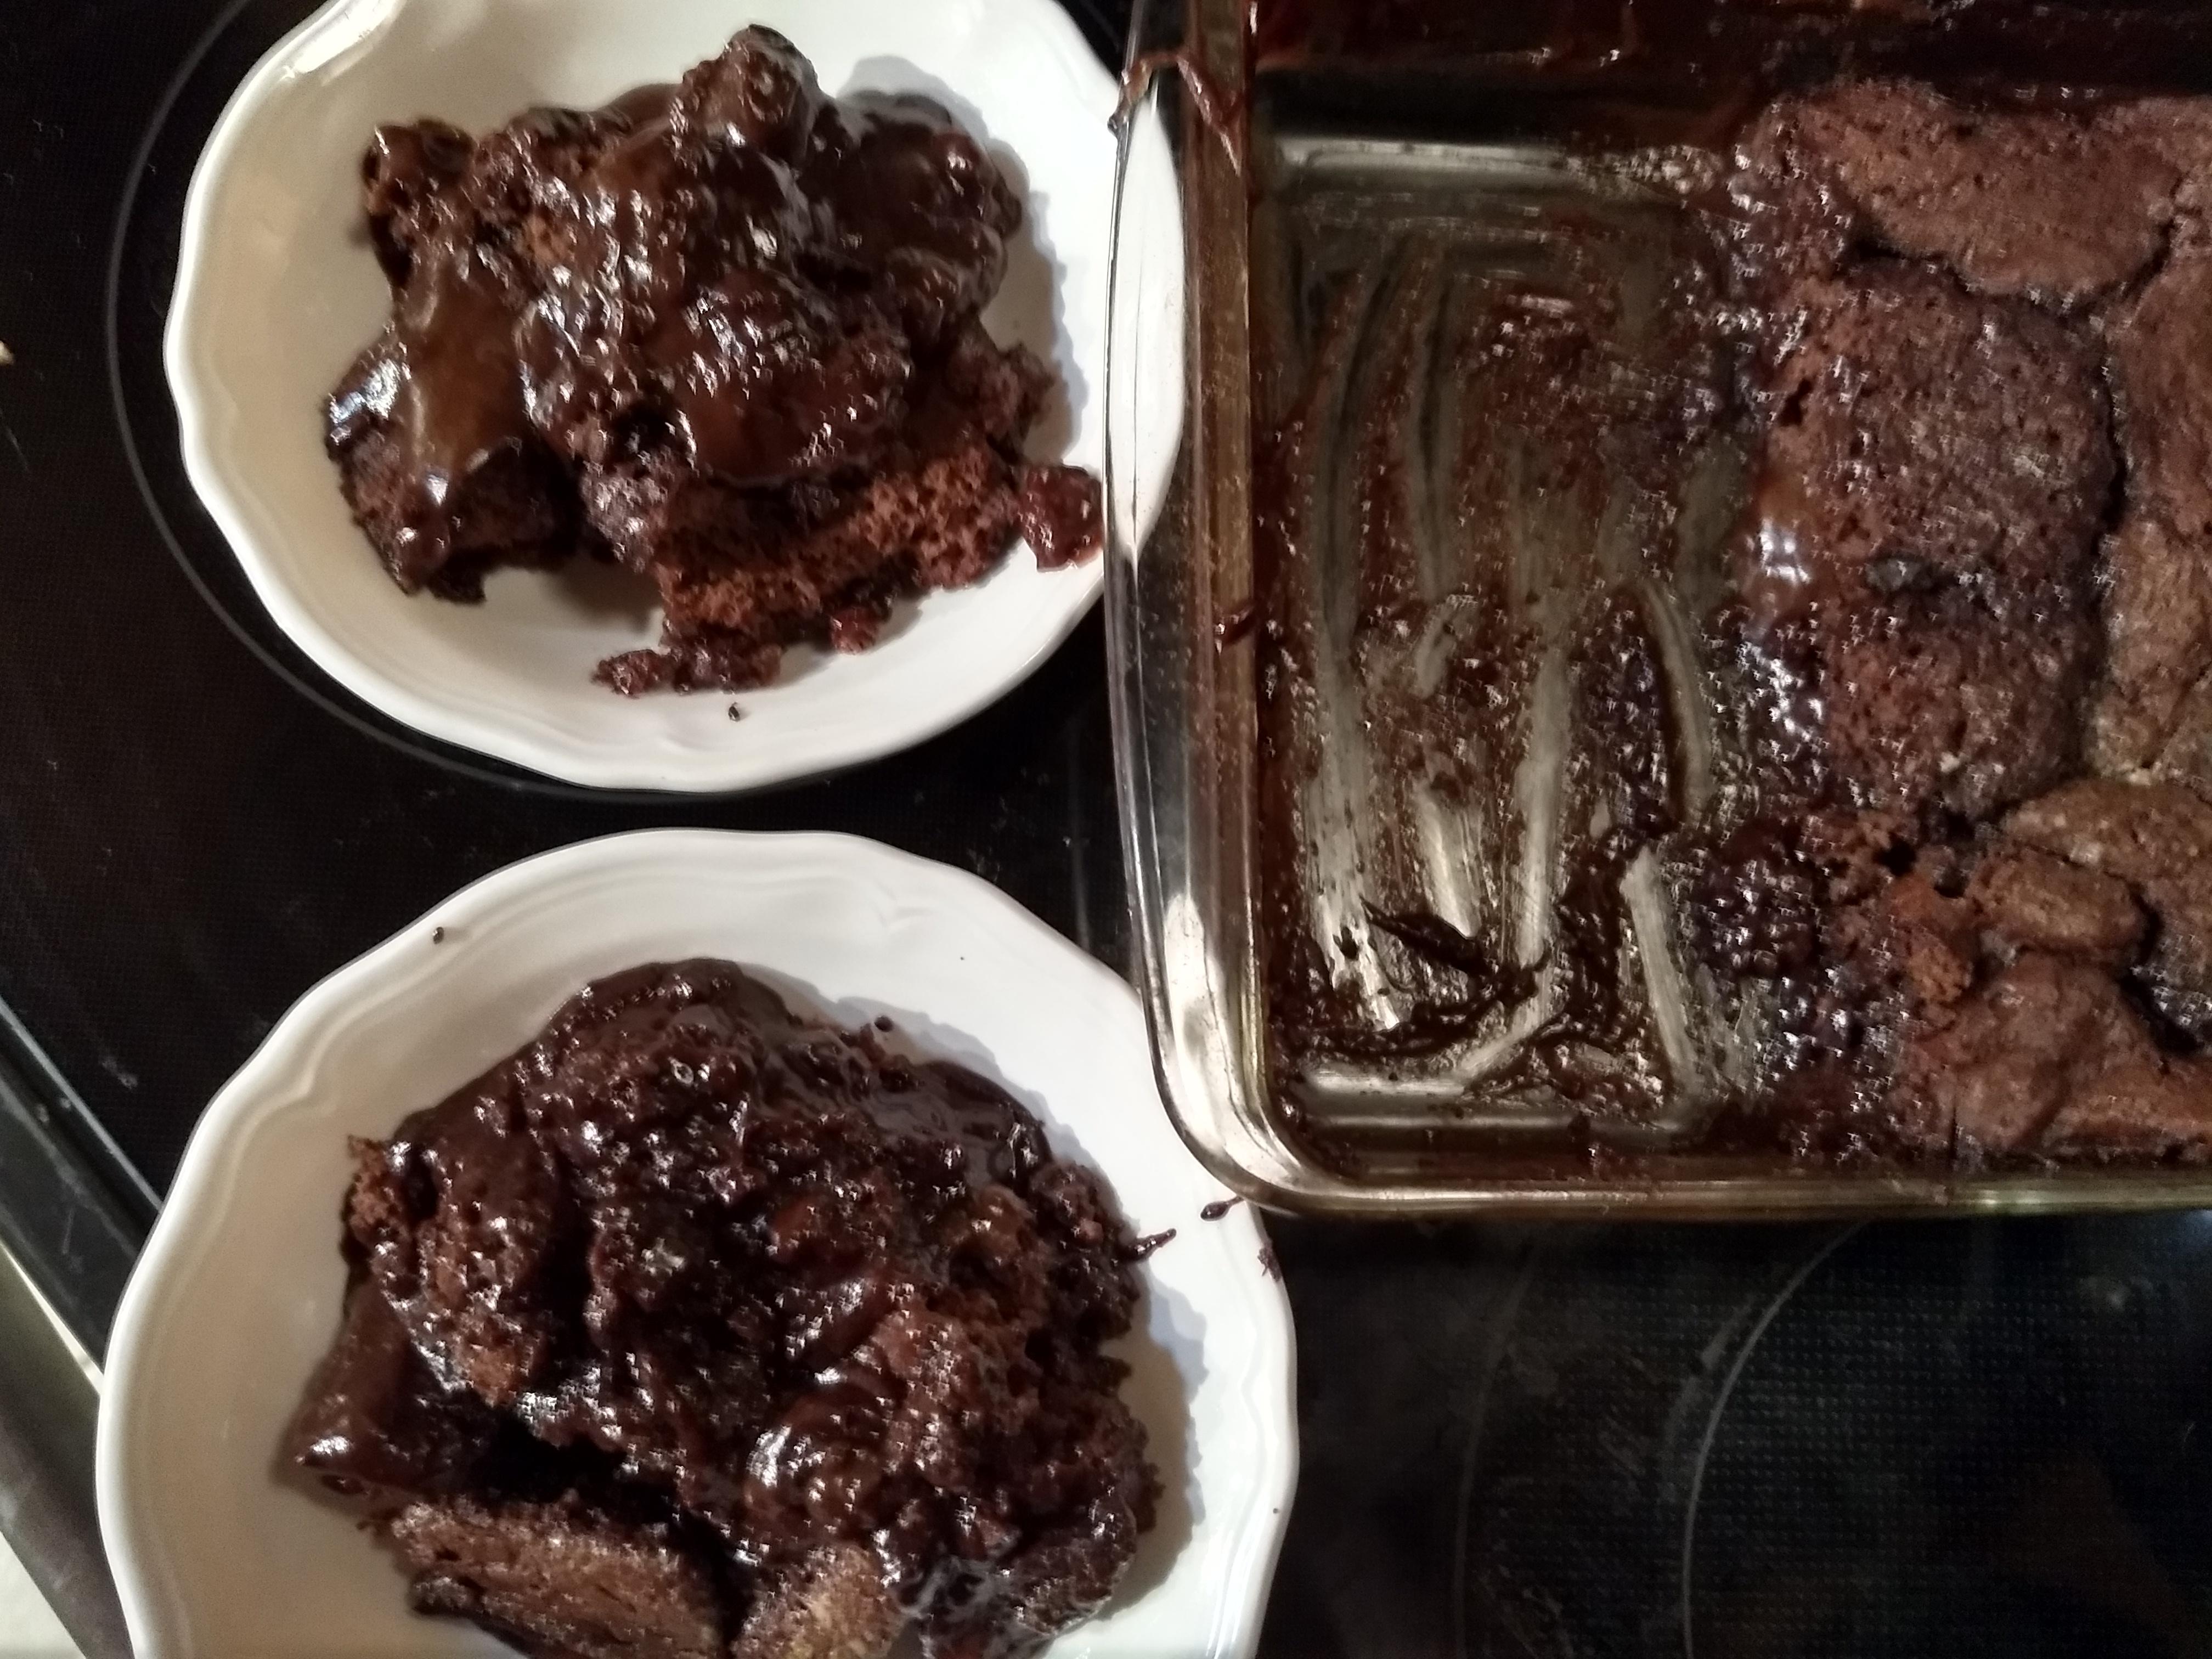 Chocolate Cobbler image